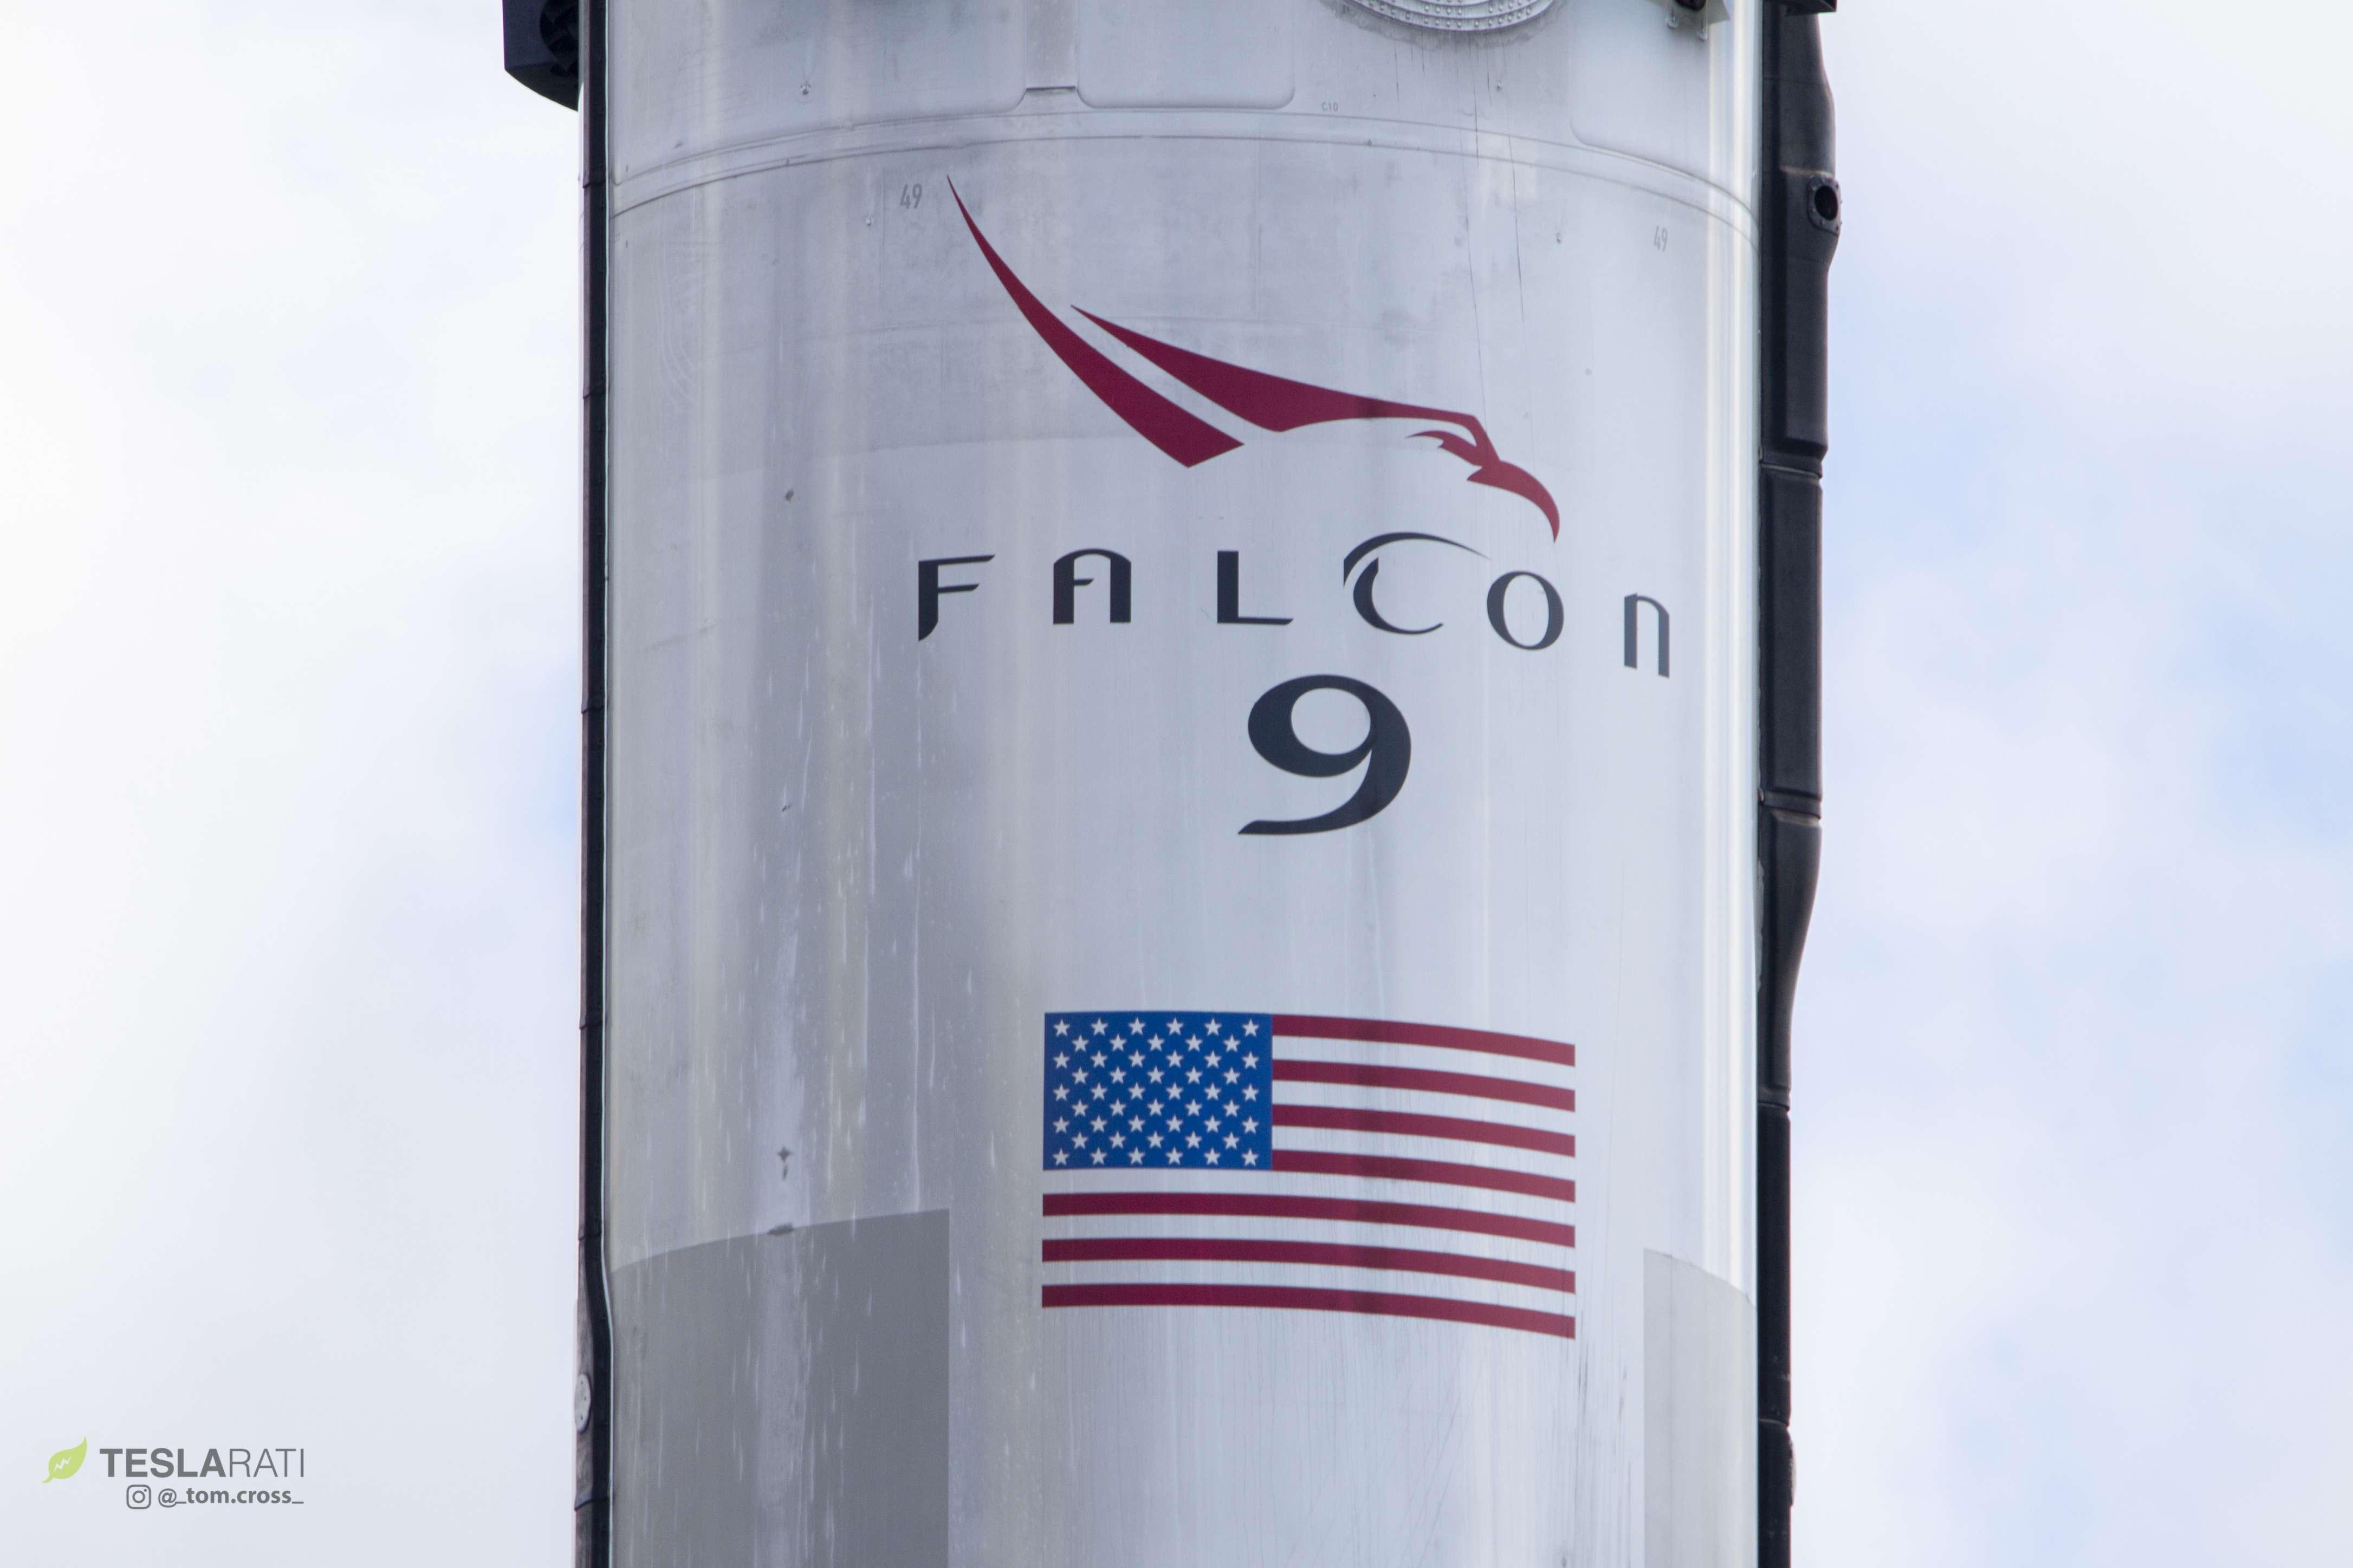 Falcon 9 B1049 OCISLY return detail 091218 (Tom Cross) 8(c)